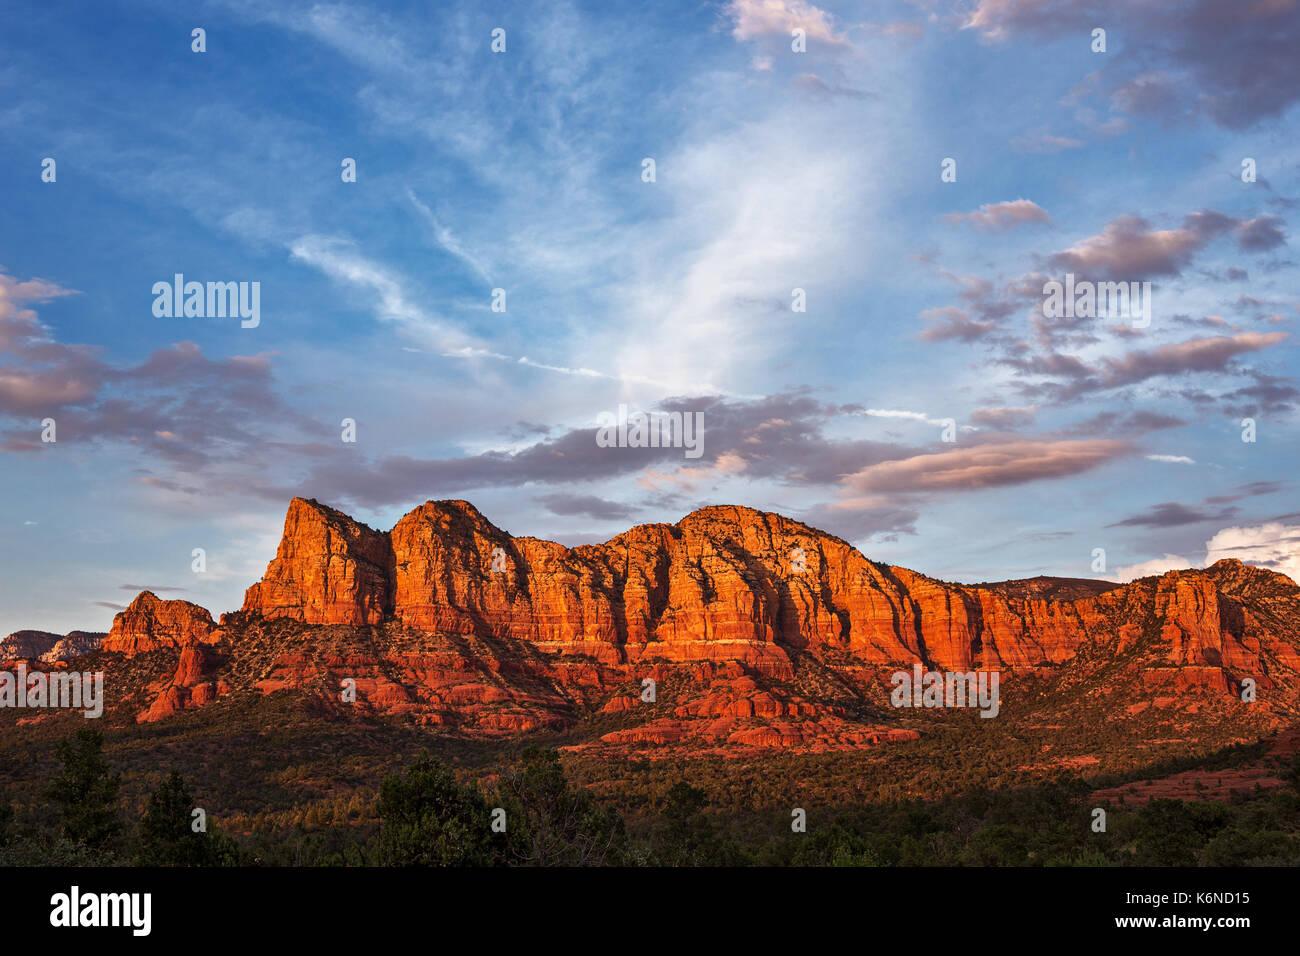 Sunset over the red rocks in Sedona, Arizona Stock Photo